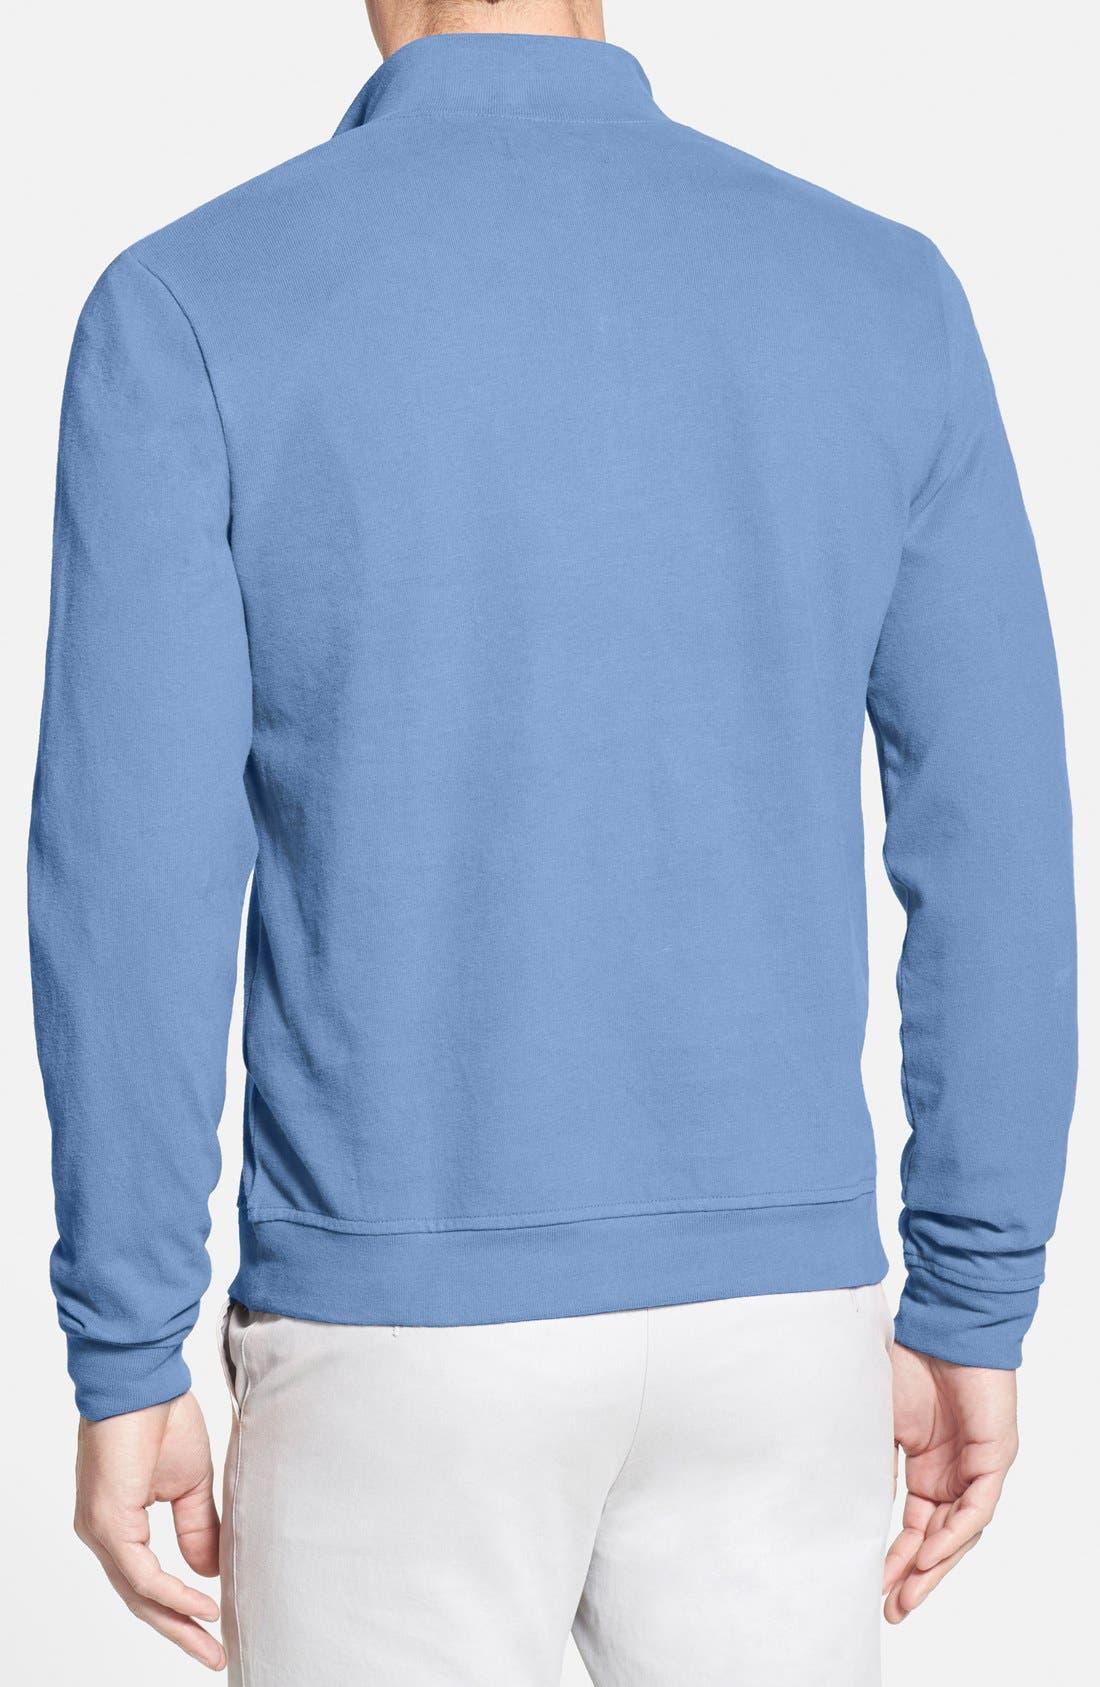 Alternate Image 2  - Nordstrom Quarter Zip Cotton Pullover